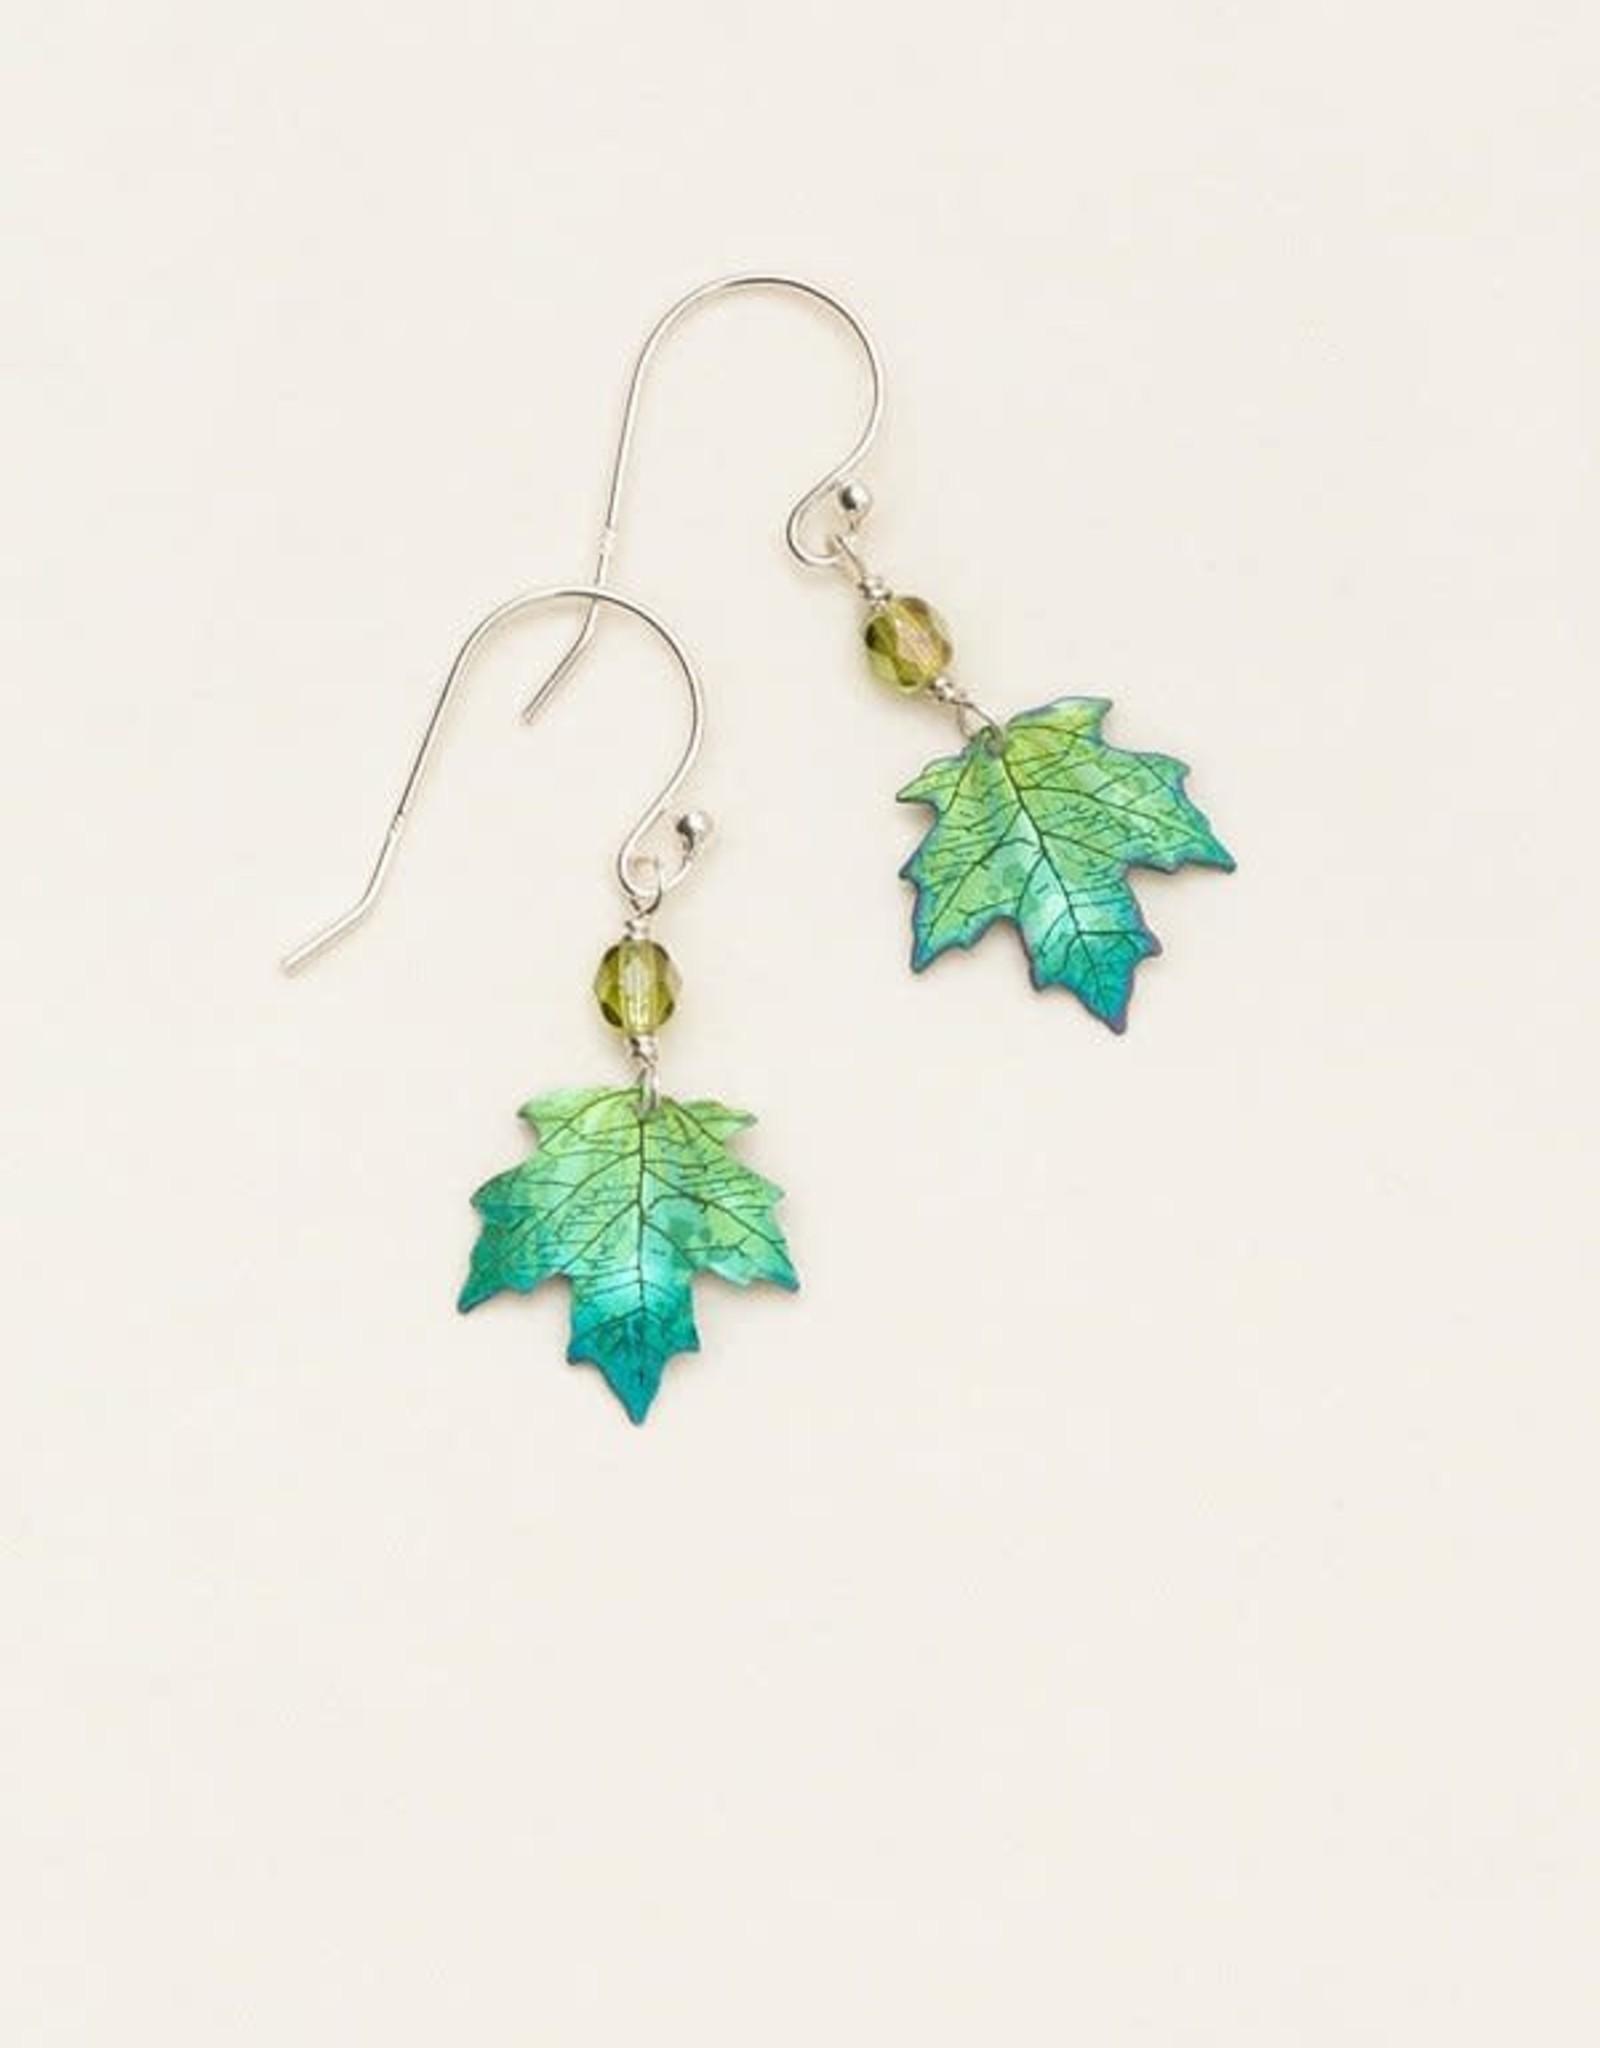 Holly Yashi Green Sugar Maple Earrings